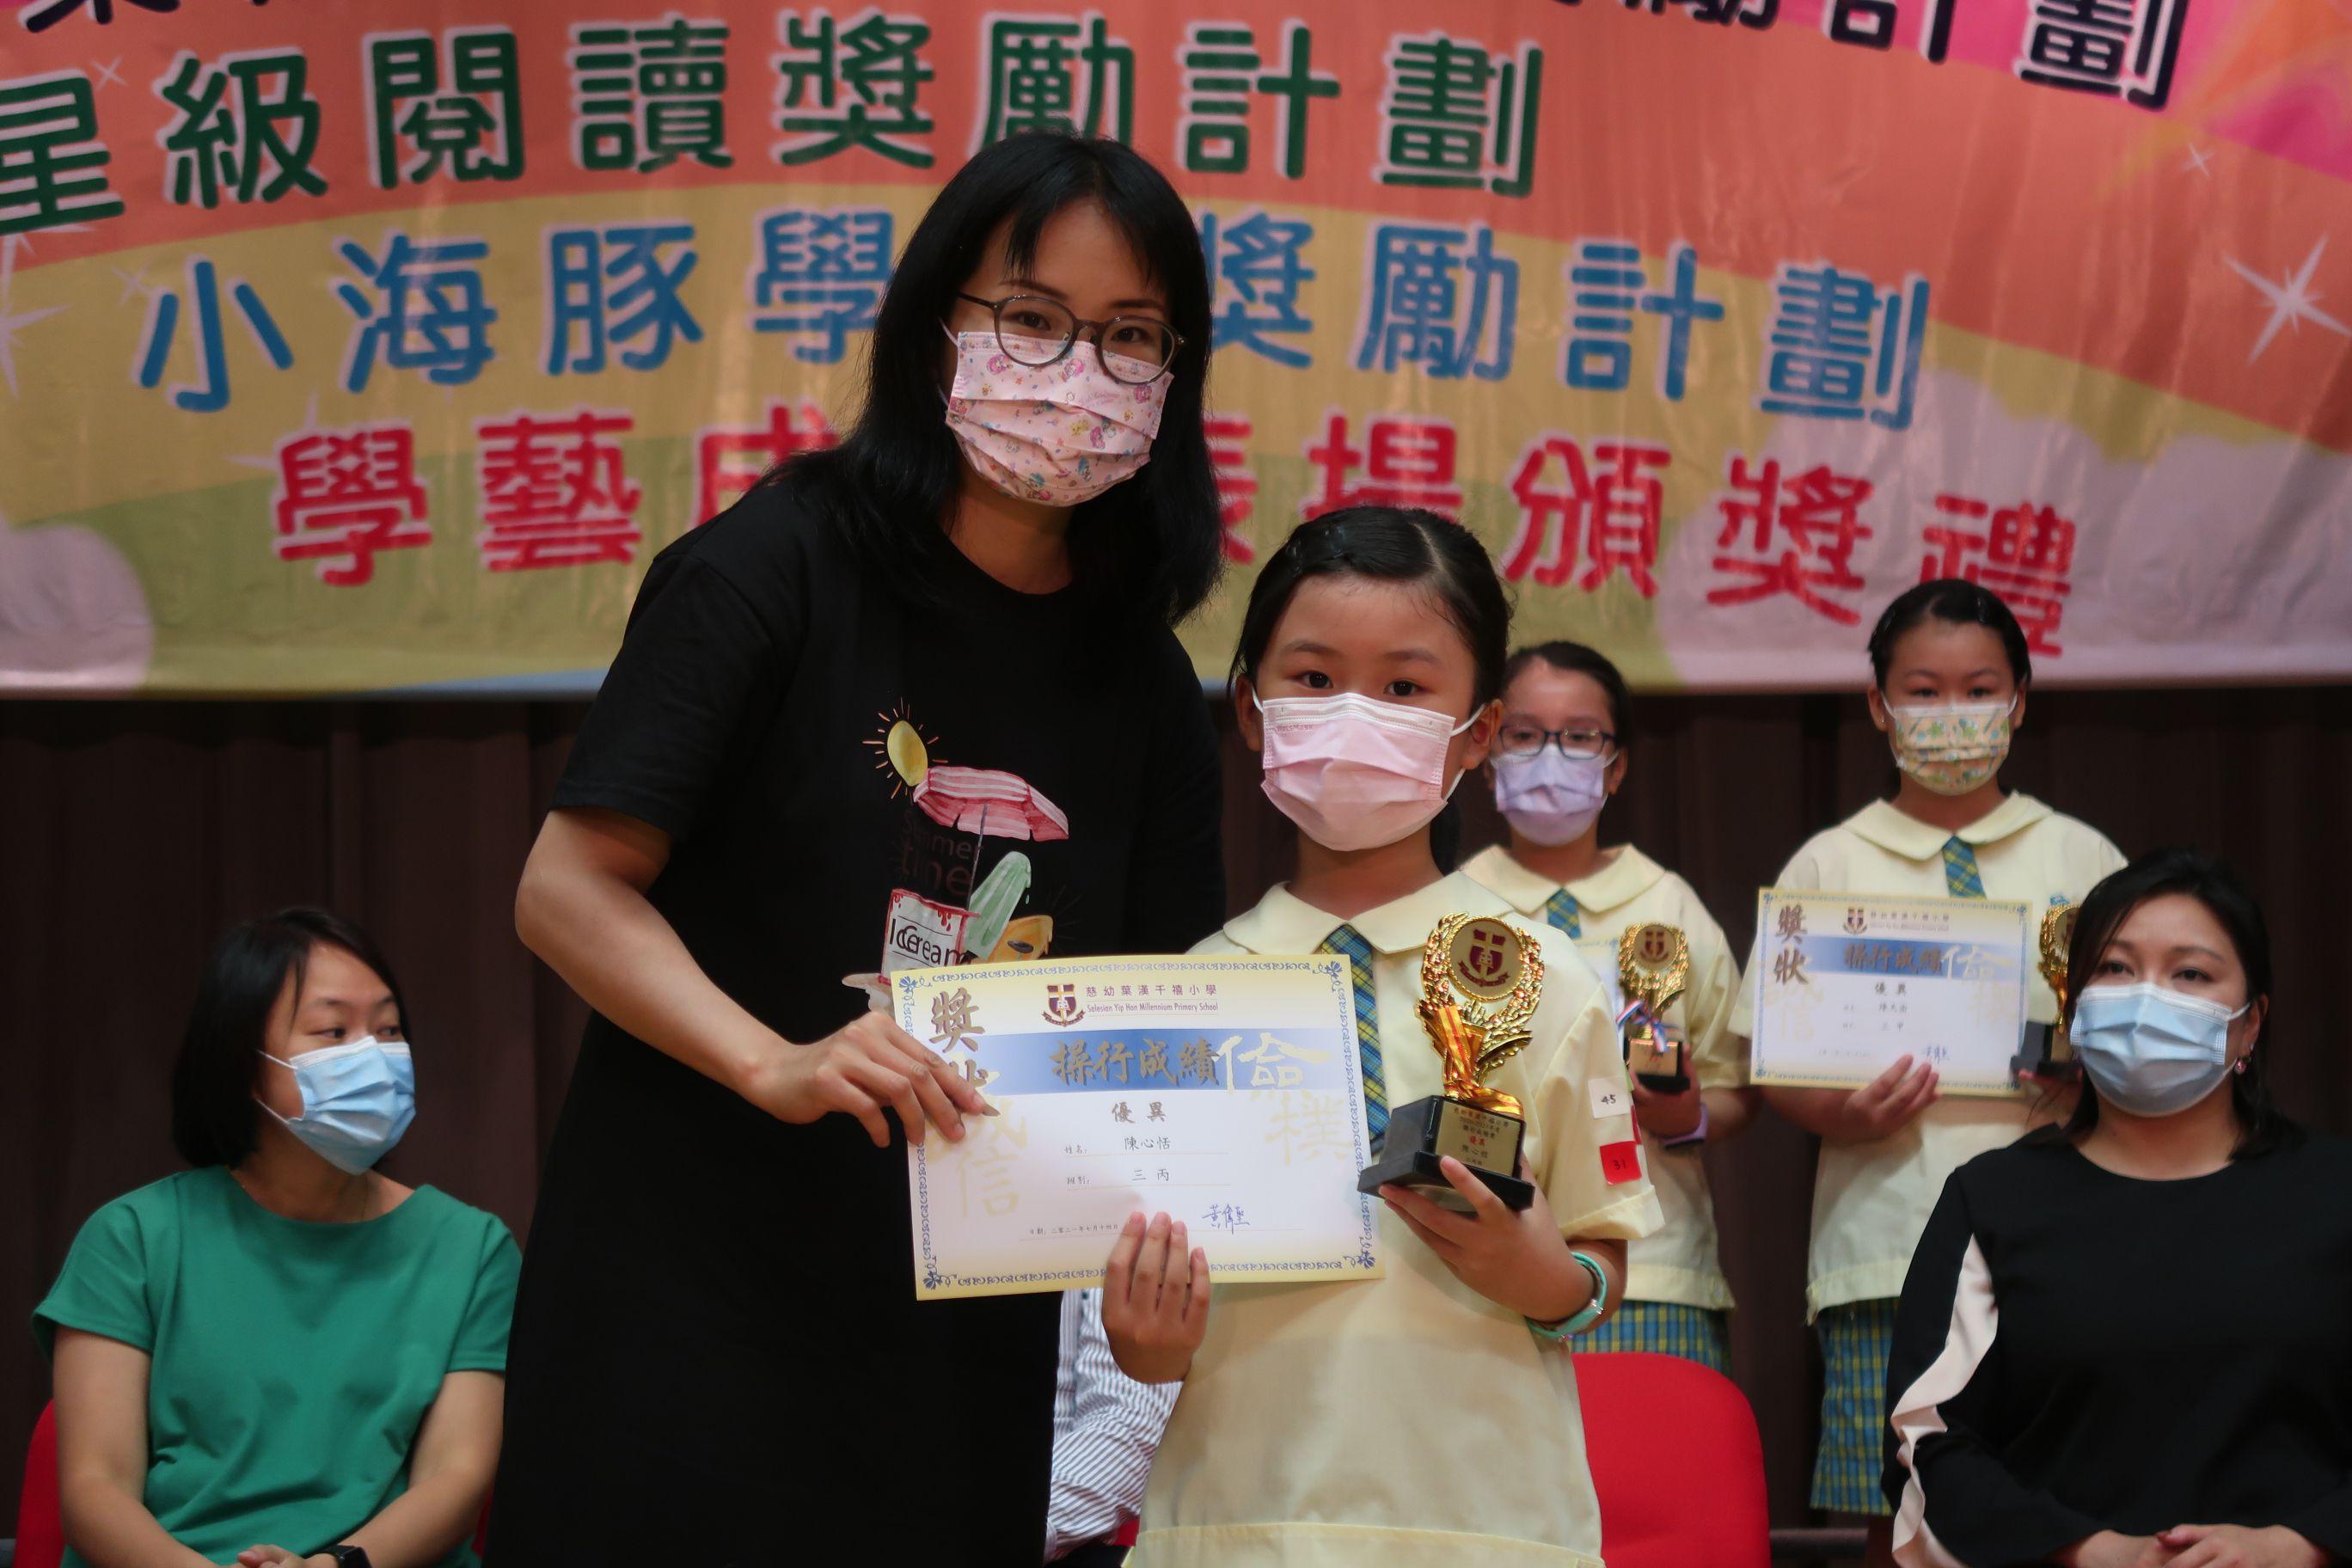 https://syh.edu.hk/sites/default/files/img_5489.jpg